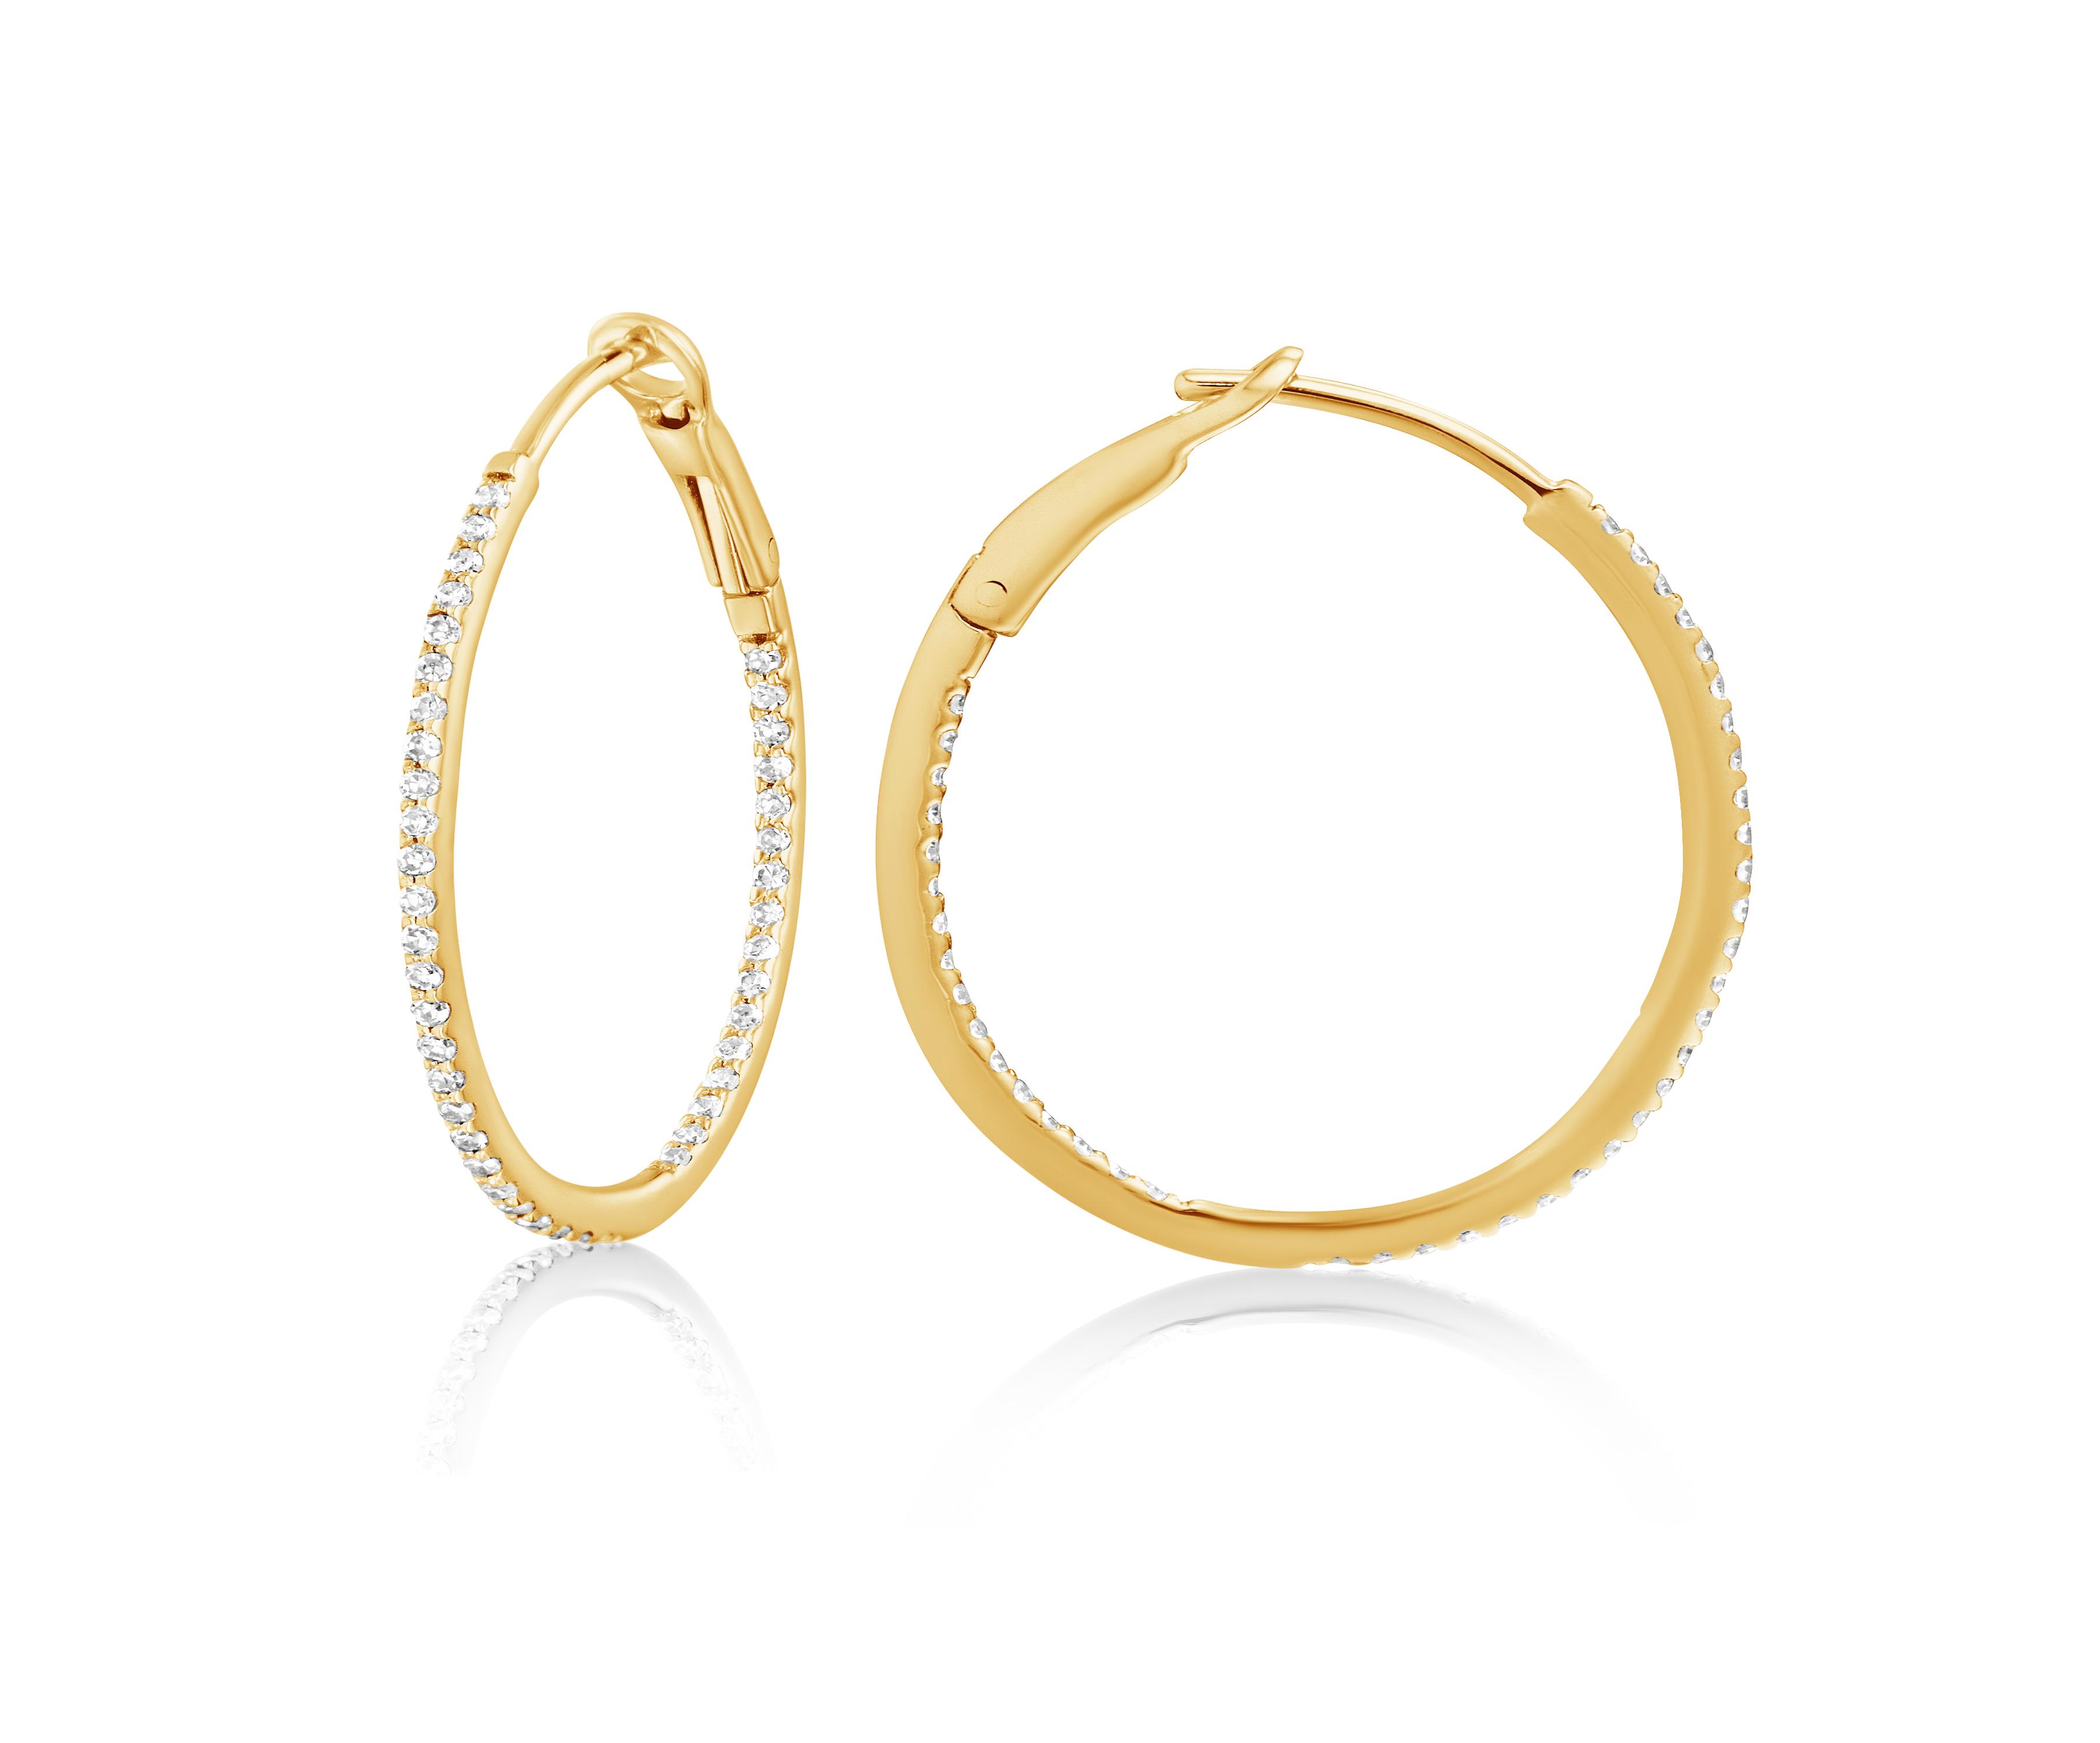 Diamond 25mm Round Skinny Hoop Earrings 14K Yellow Gold from Allurez.